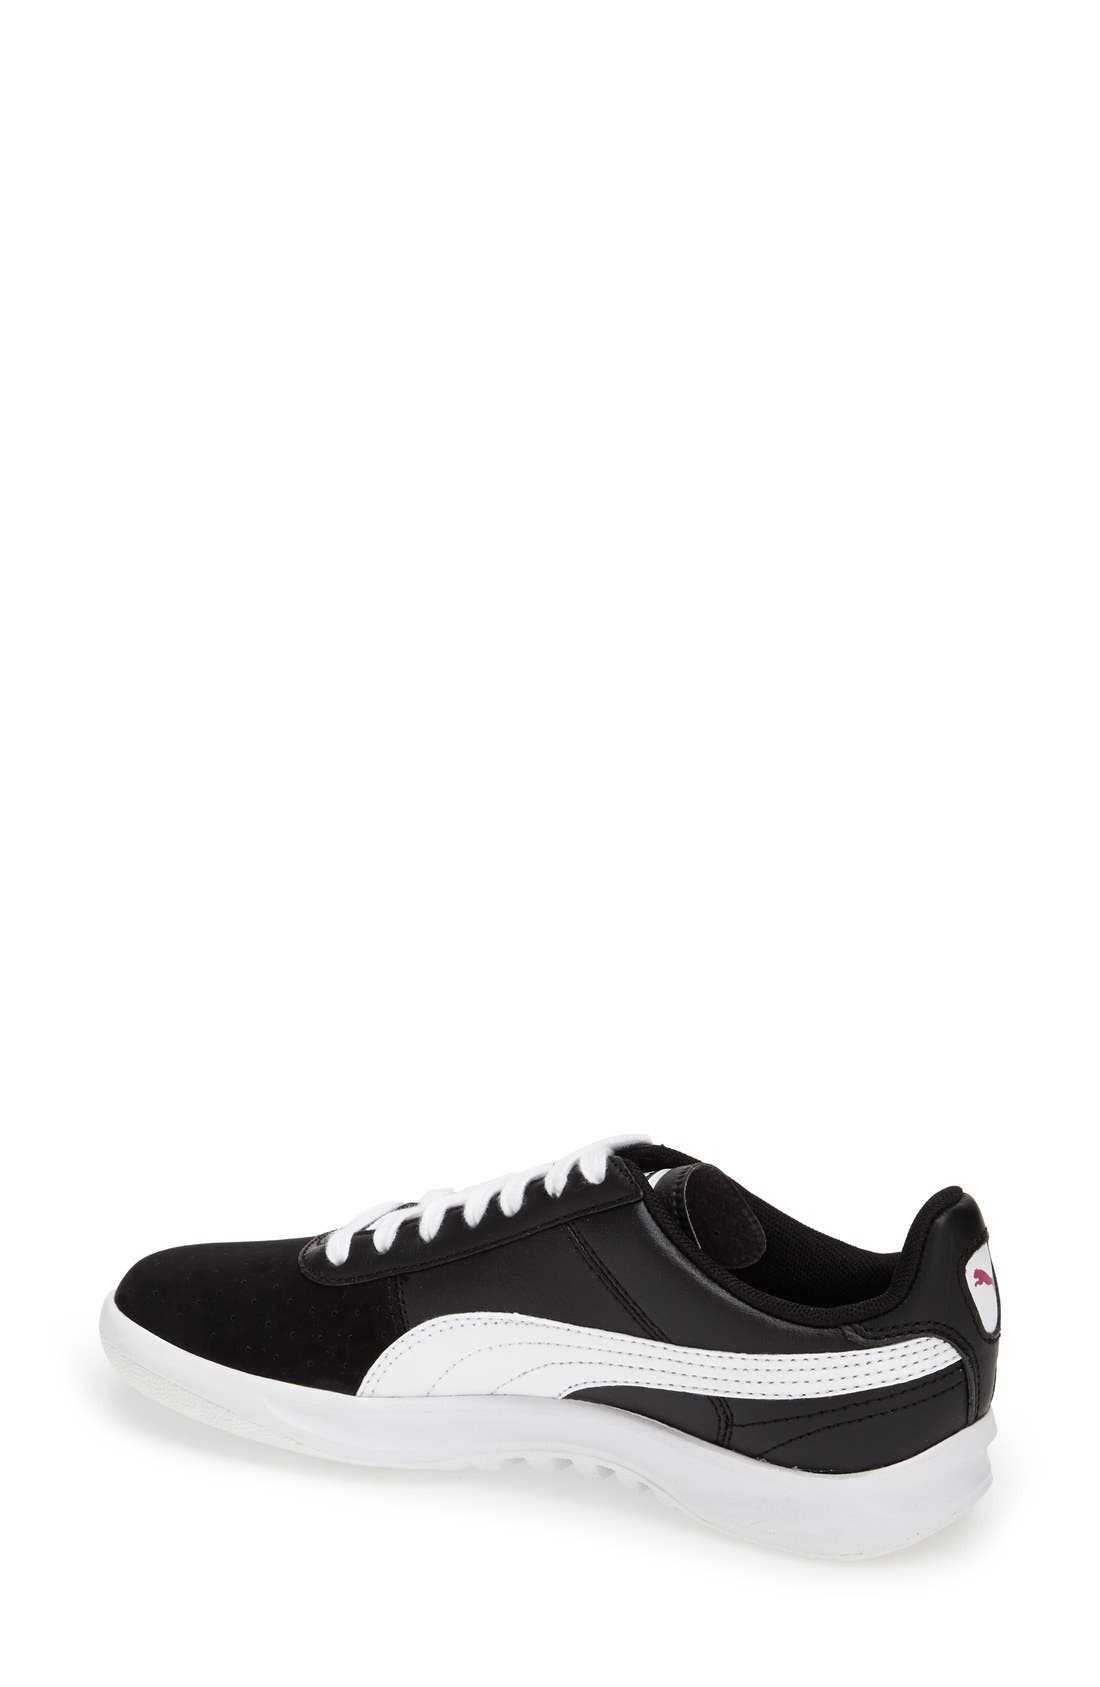 Alternate Image 2  - PUMA 'G. Vilas - Basic Sport' Sneaker (Women)